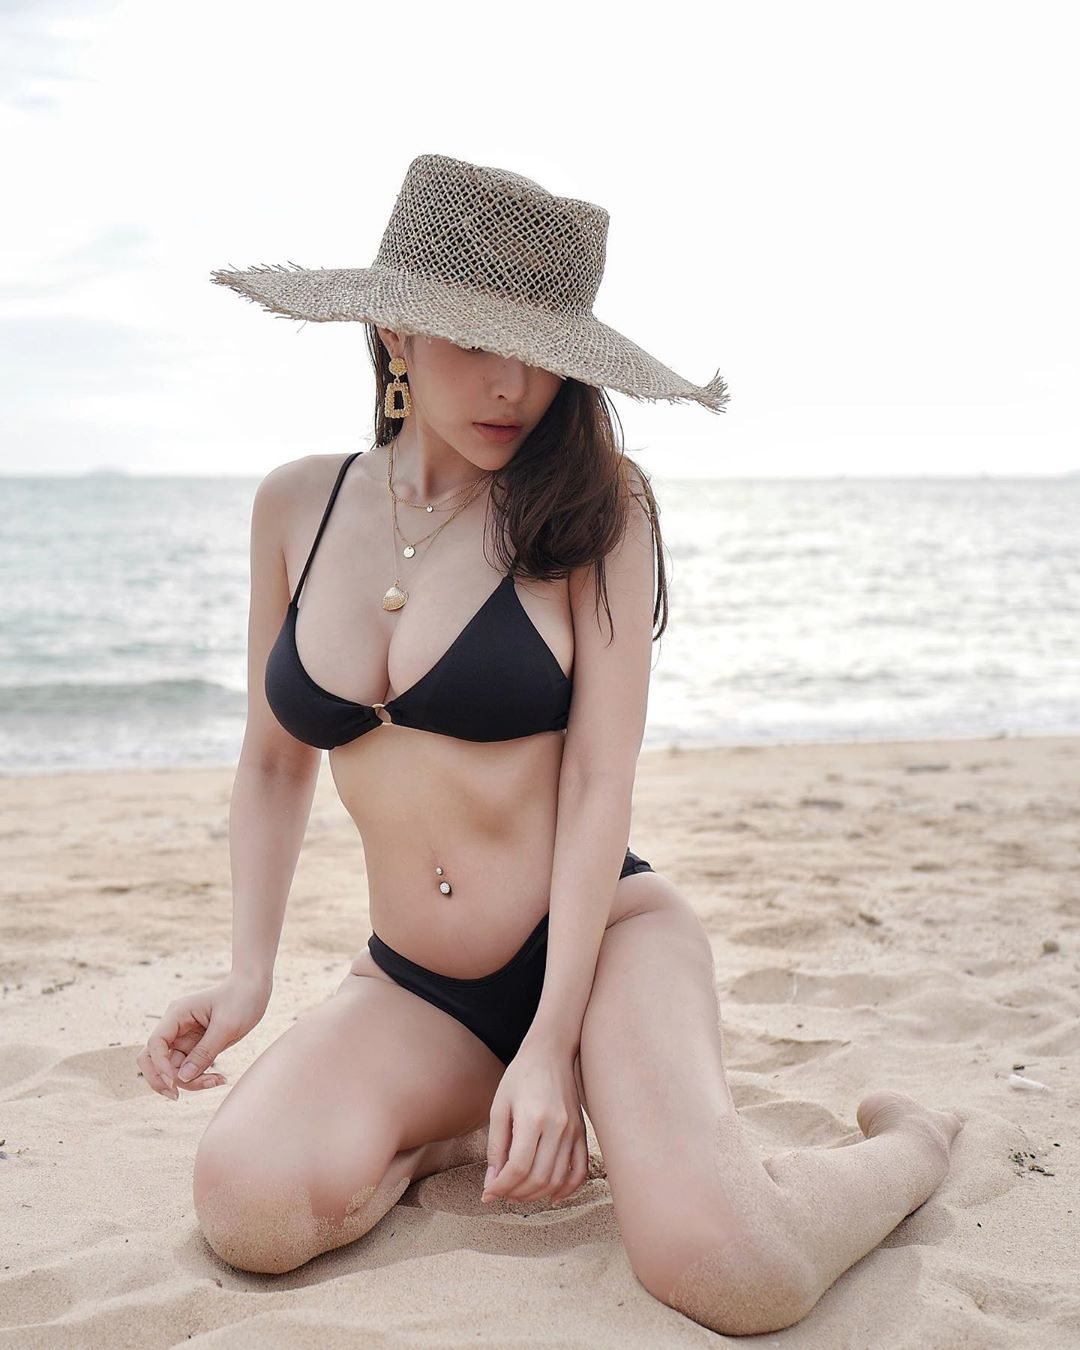 sexy, cute, pretty, bikini